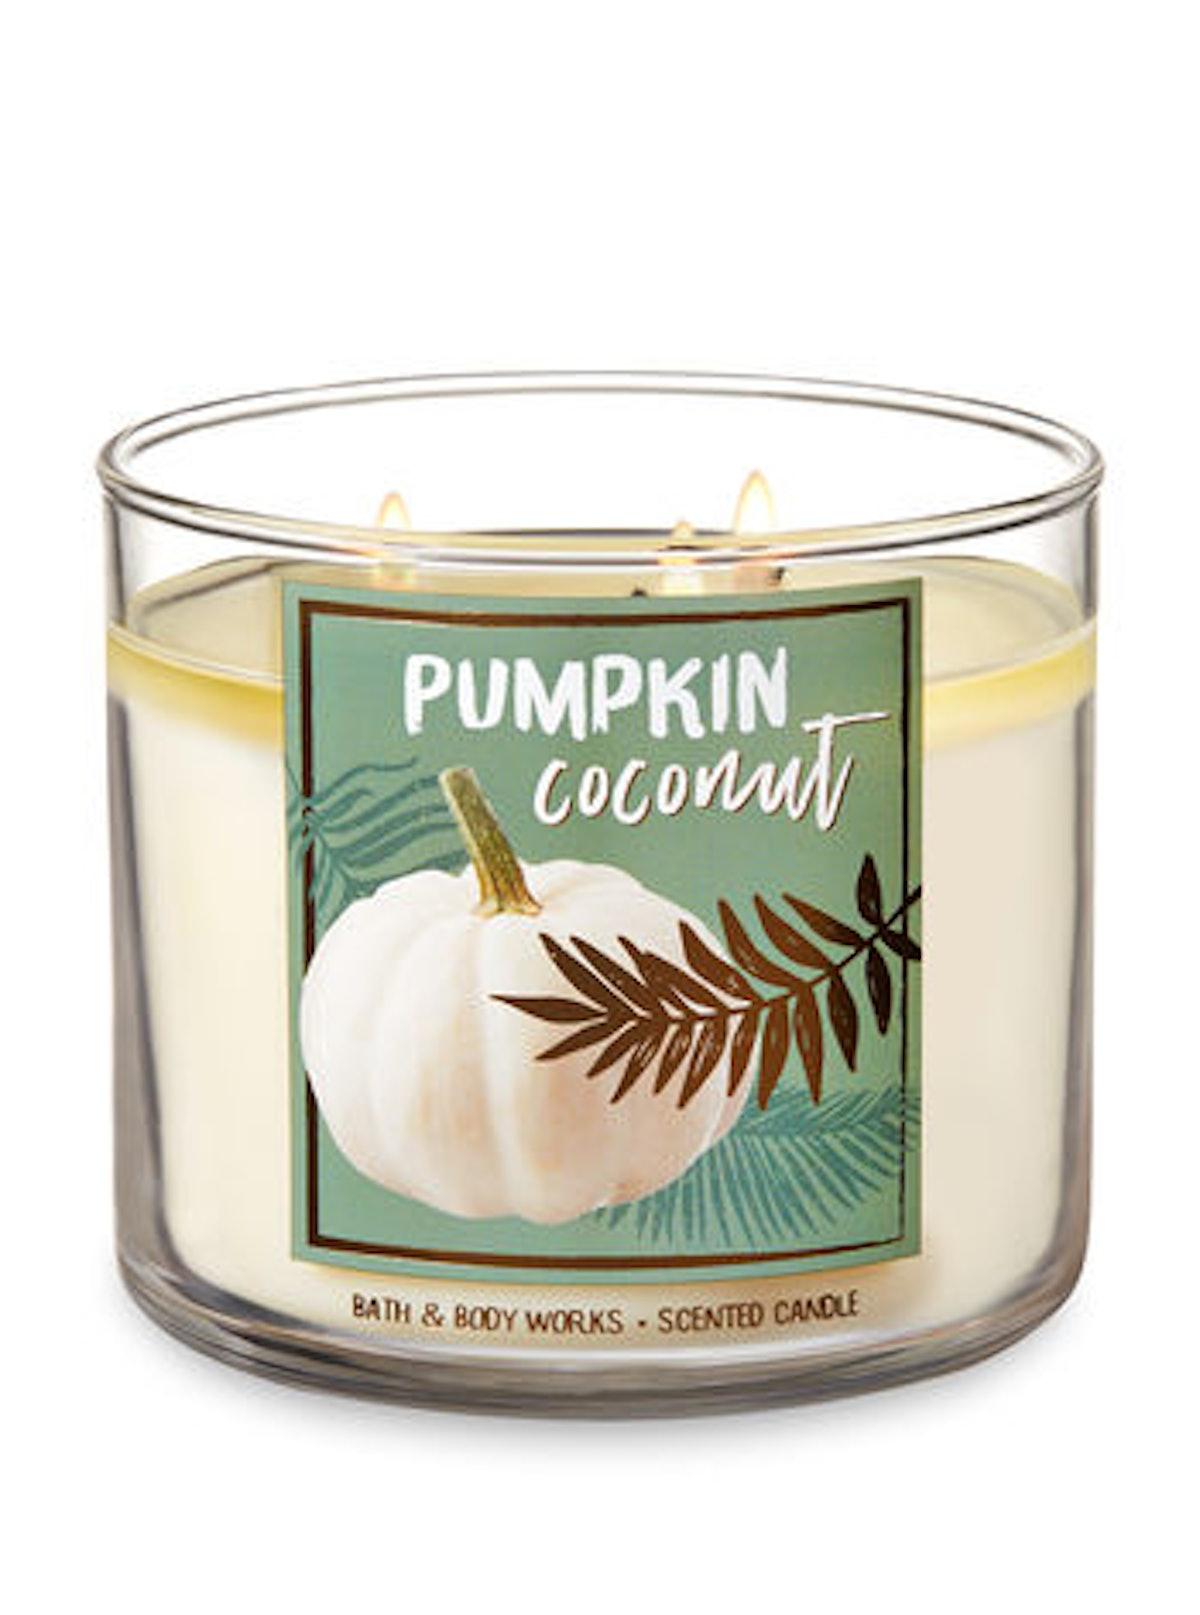 PUMPKIN COCONUT 3-Wick Candle